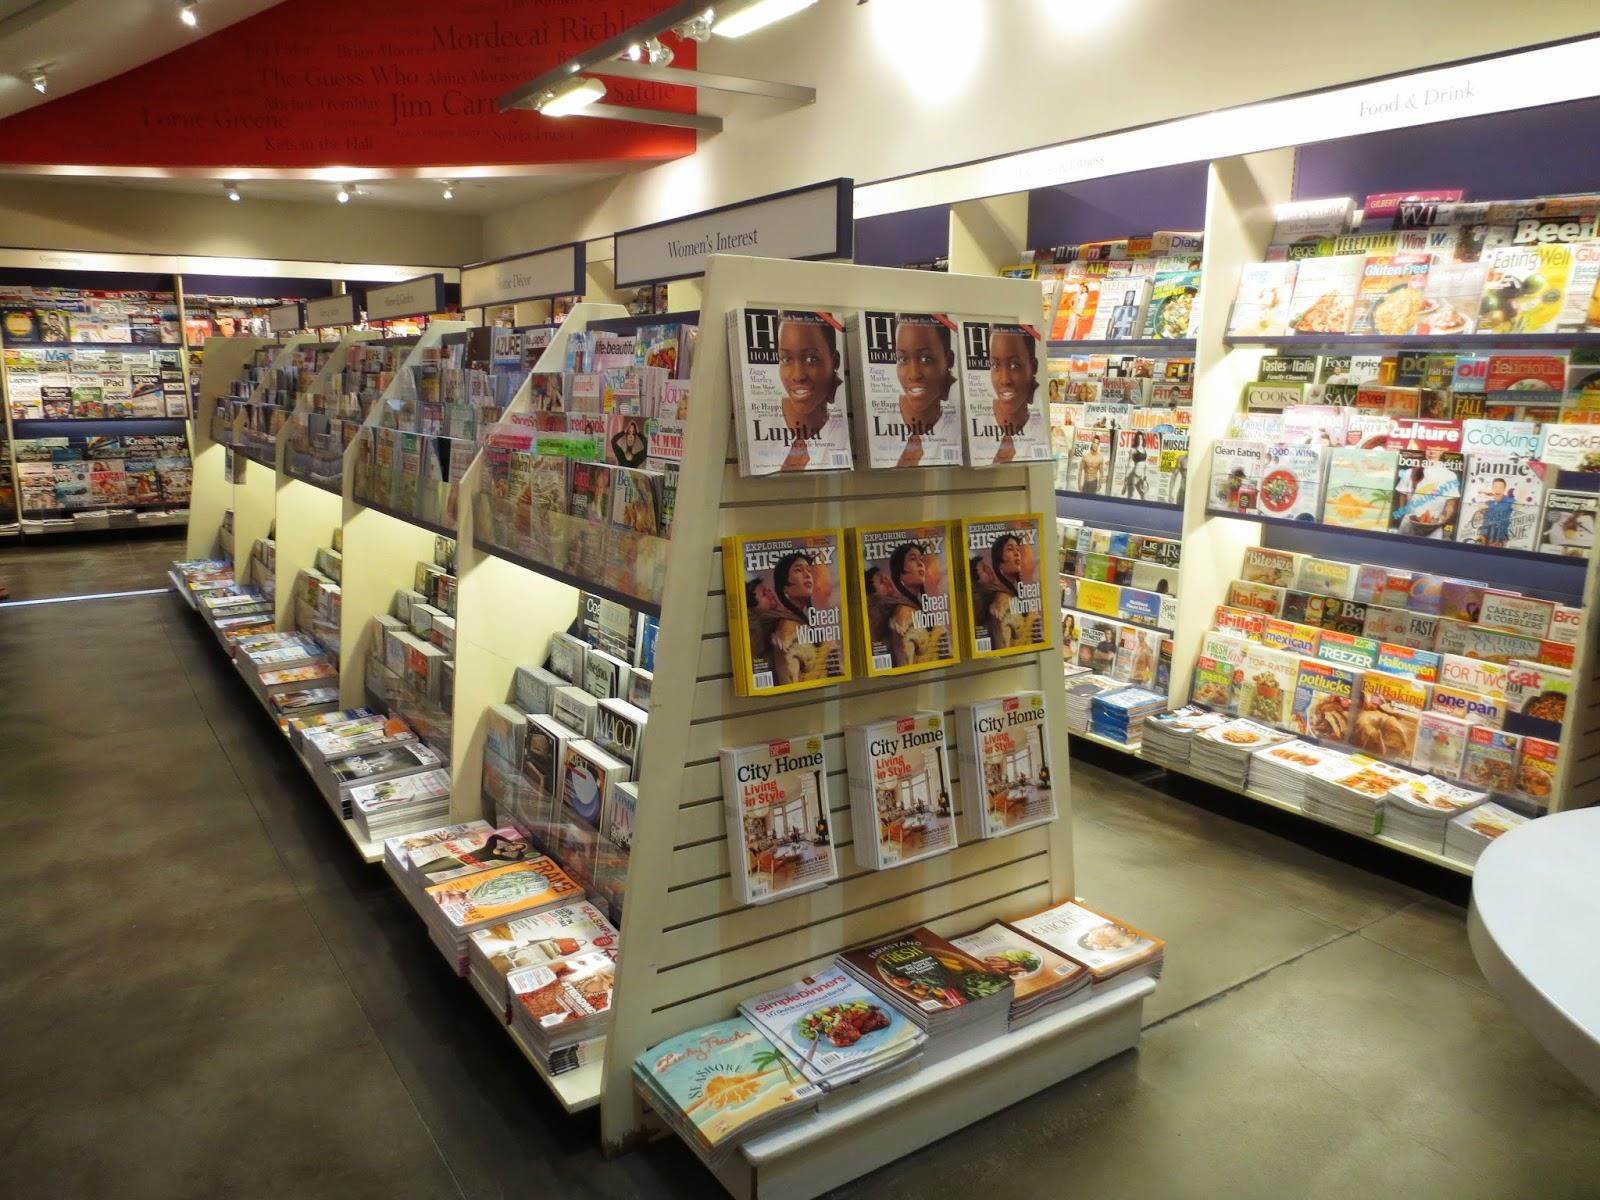 HOLR magazine, holr, magazine, canada, national magazine, toronto, indigo, chapters, malinda prudhomme, artist, artwork, portrait, art, canada